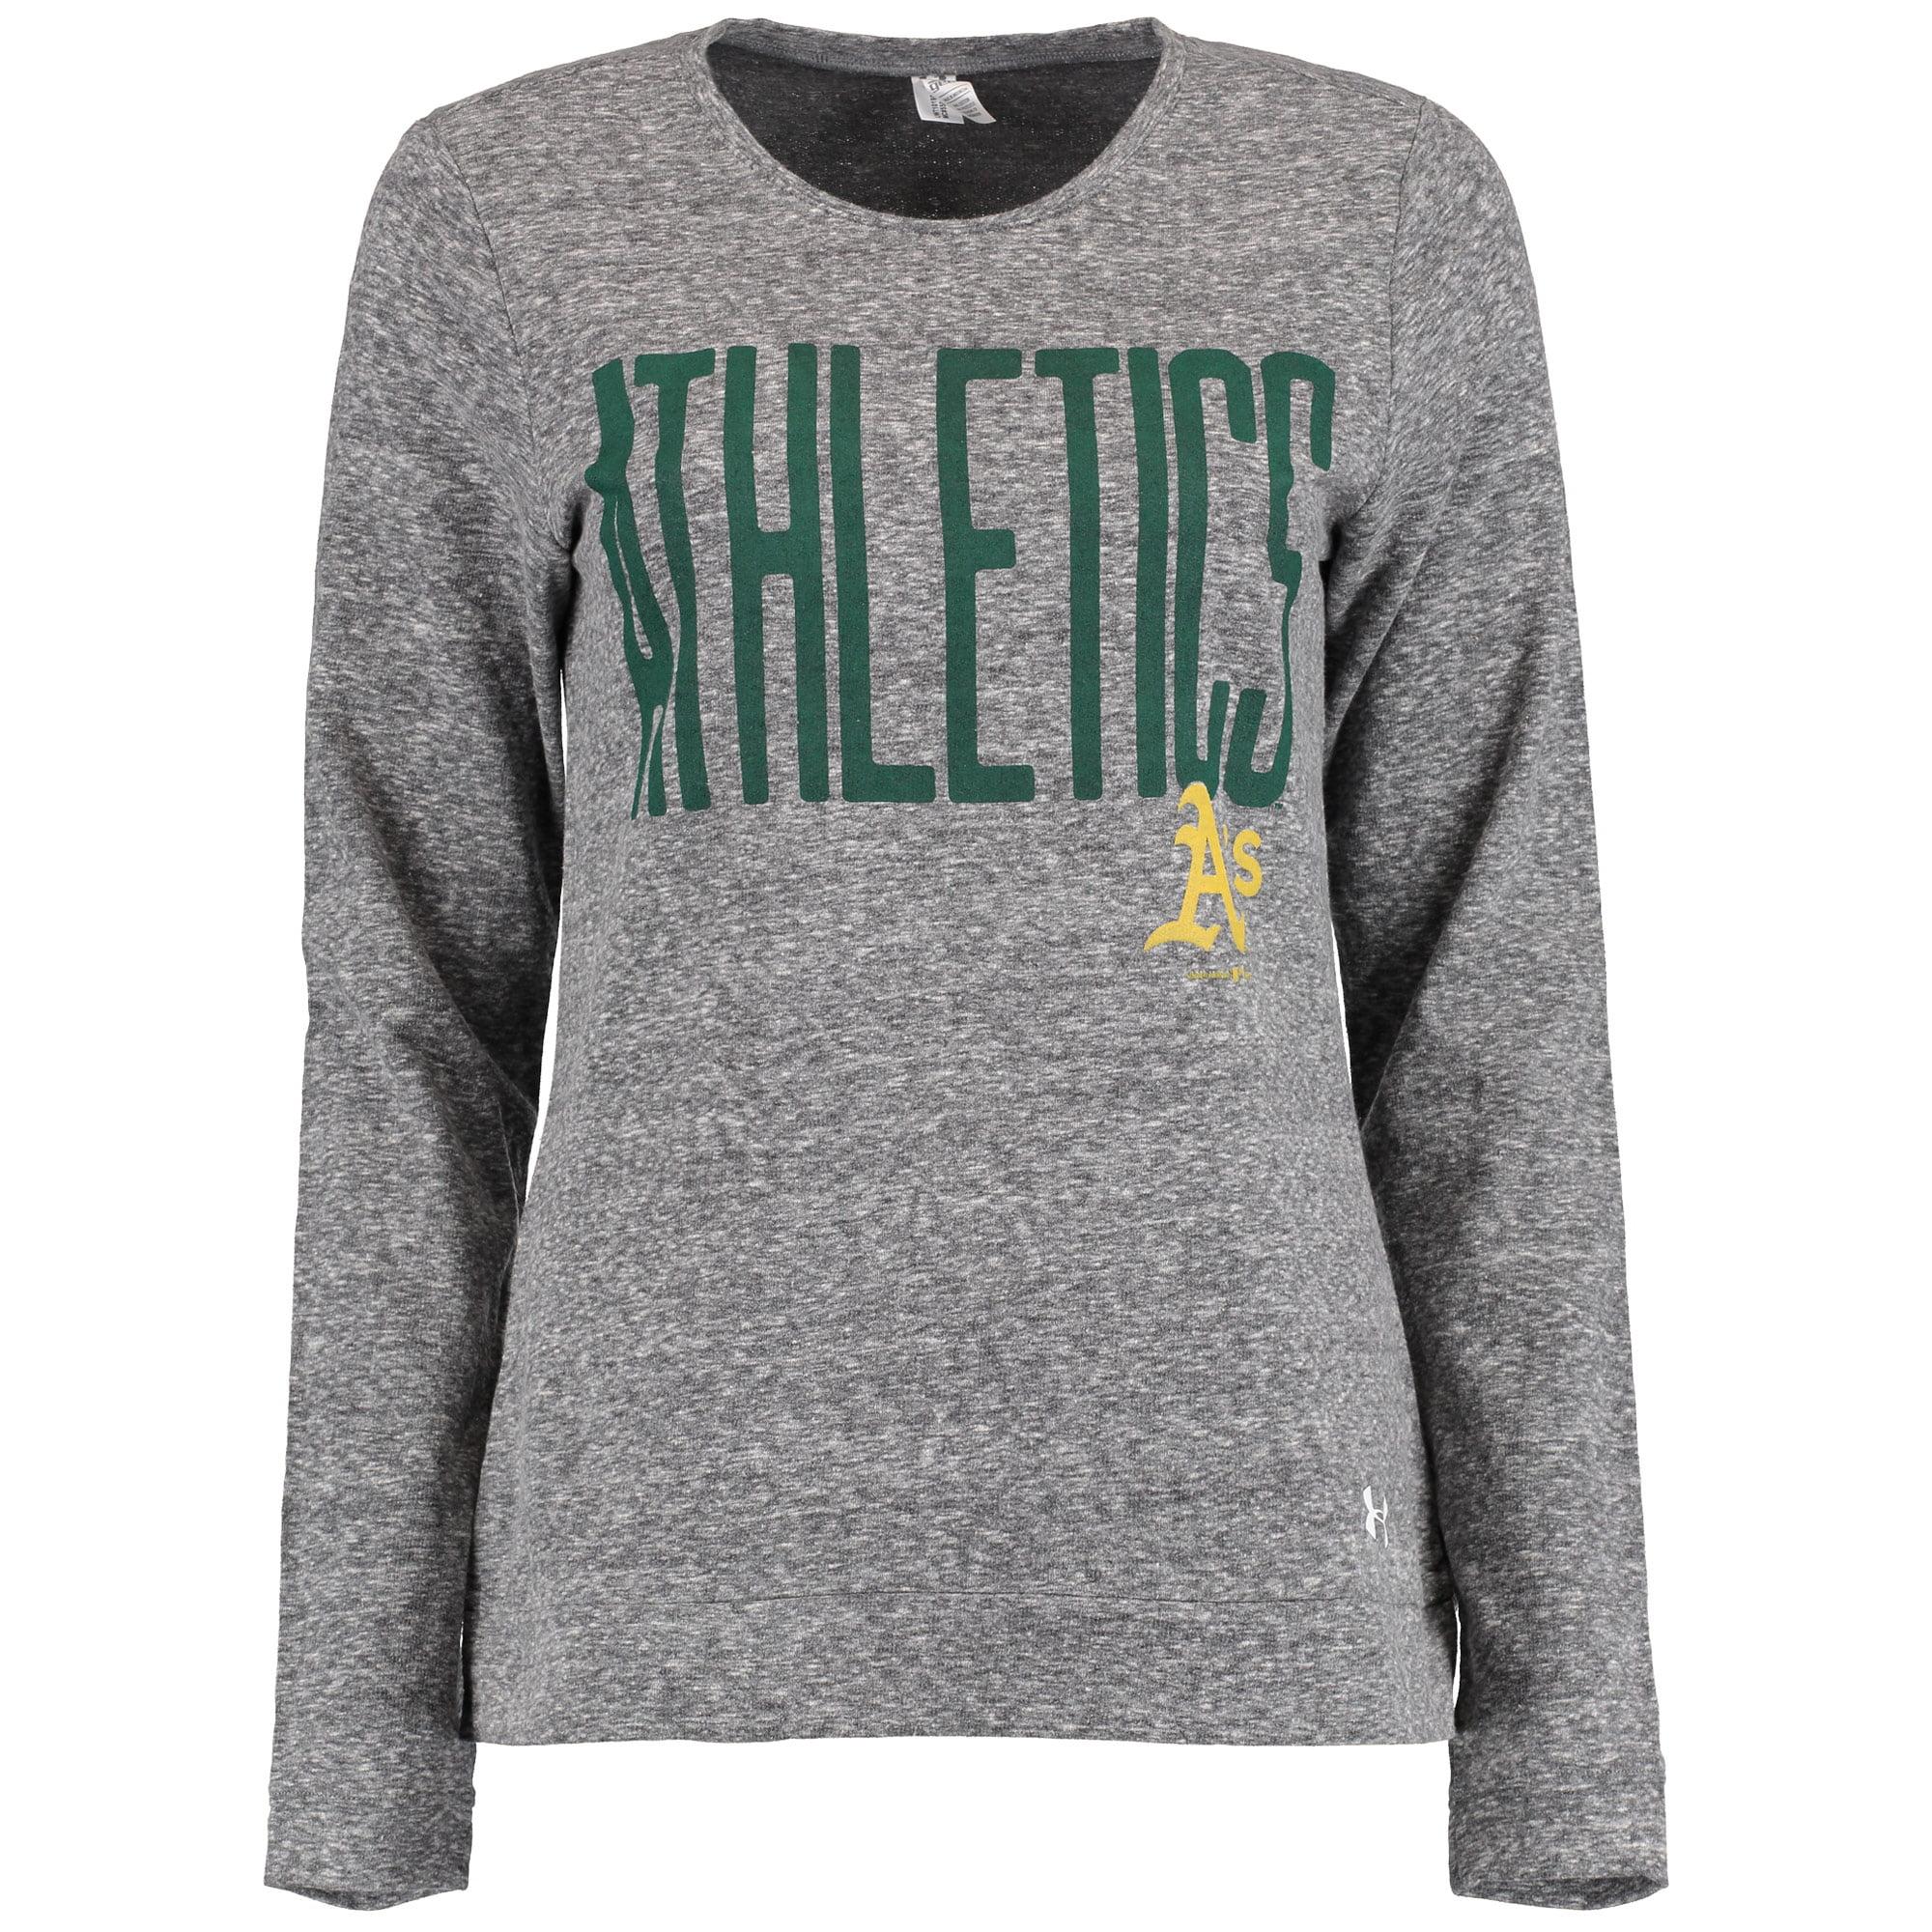 Oakland Athletics Under Armour Women's Terry Crewneck Pullover Sweatshirt - Heather Gray